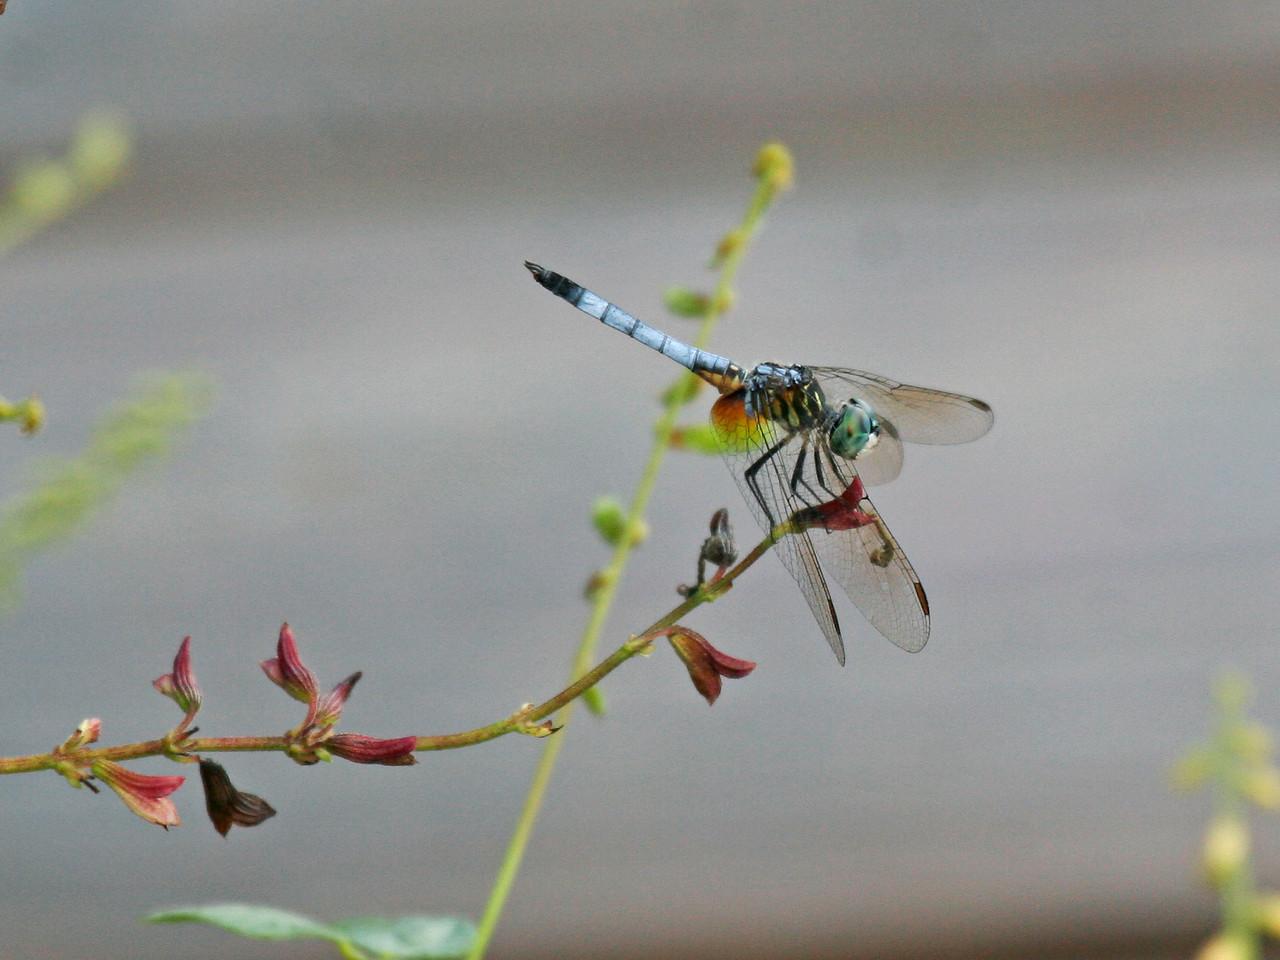 Blue Dasher Dragonfly - Brazoria NWR - Sept. 11, 2006